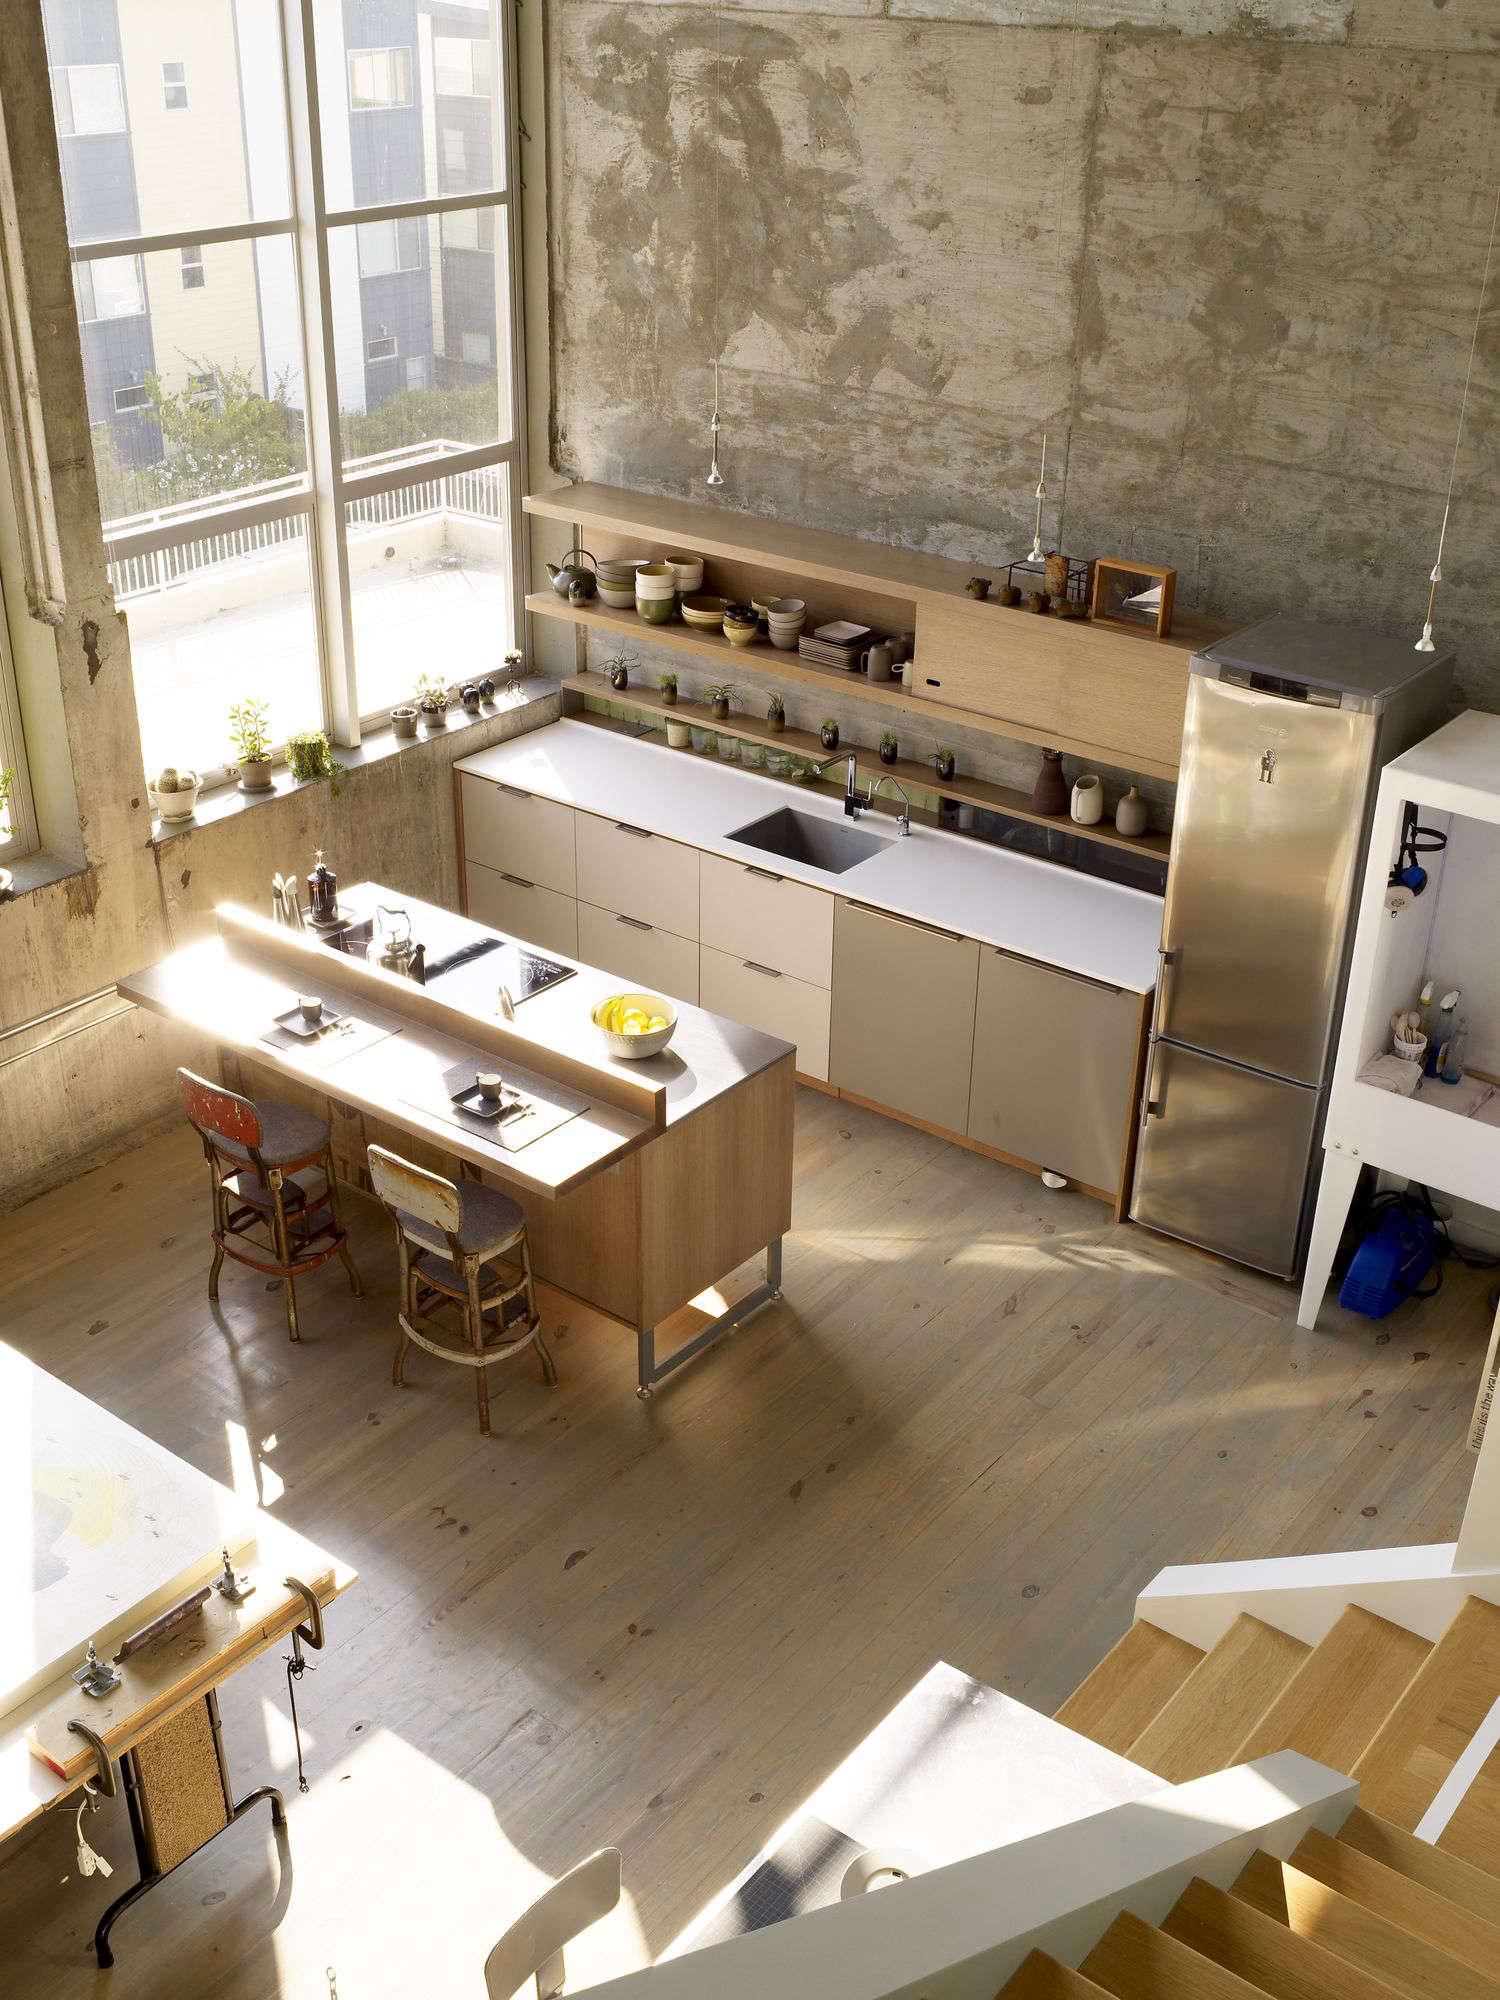 Artist Loft: Kitchen Of The Week: A Modern Live/Work Kitchen For An